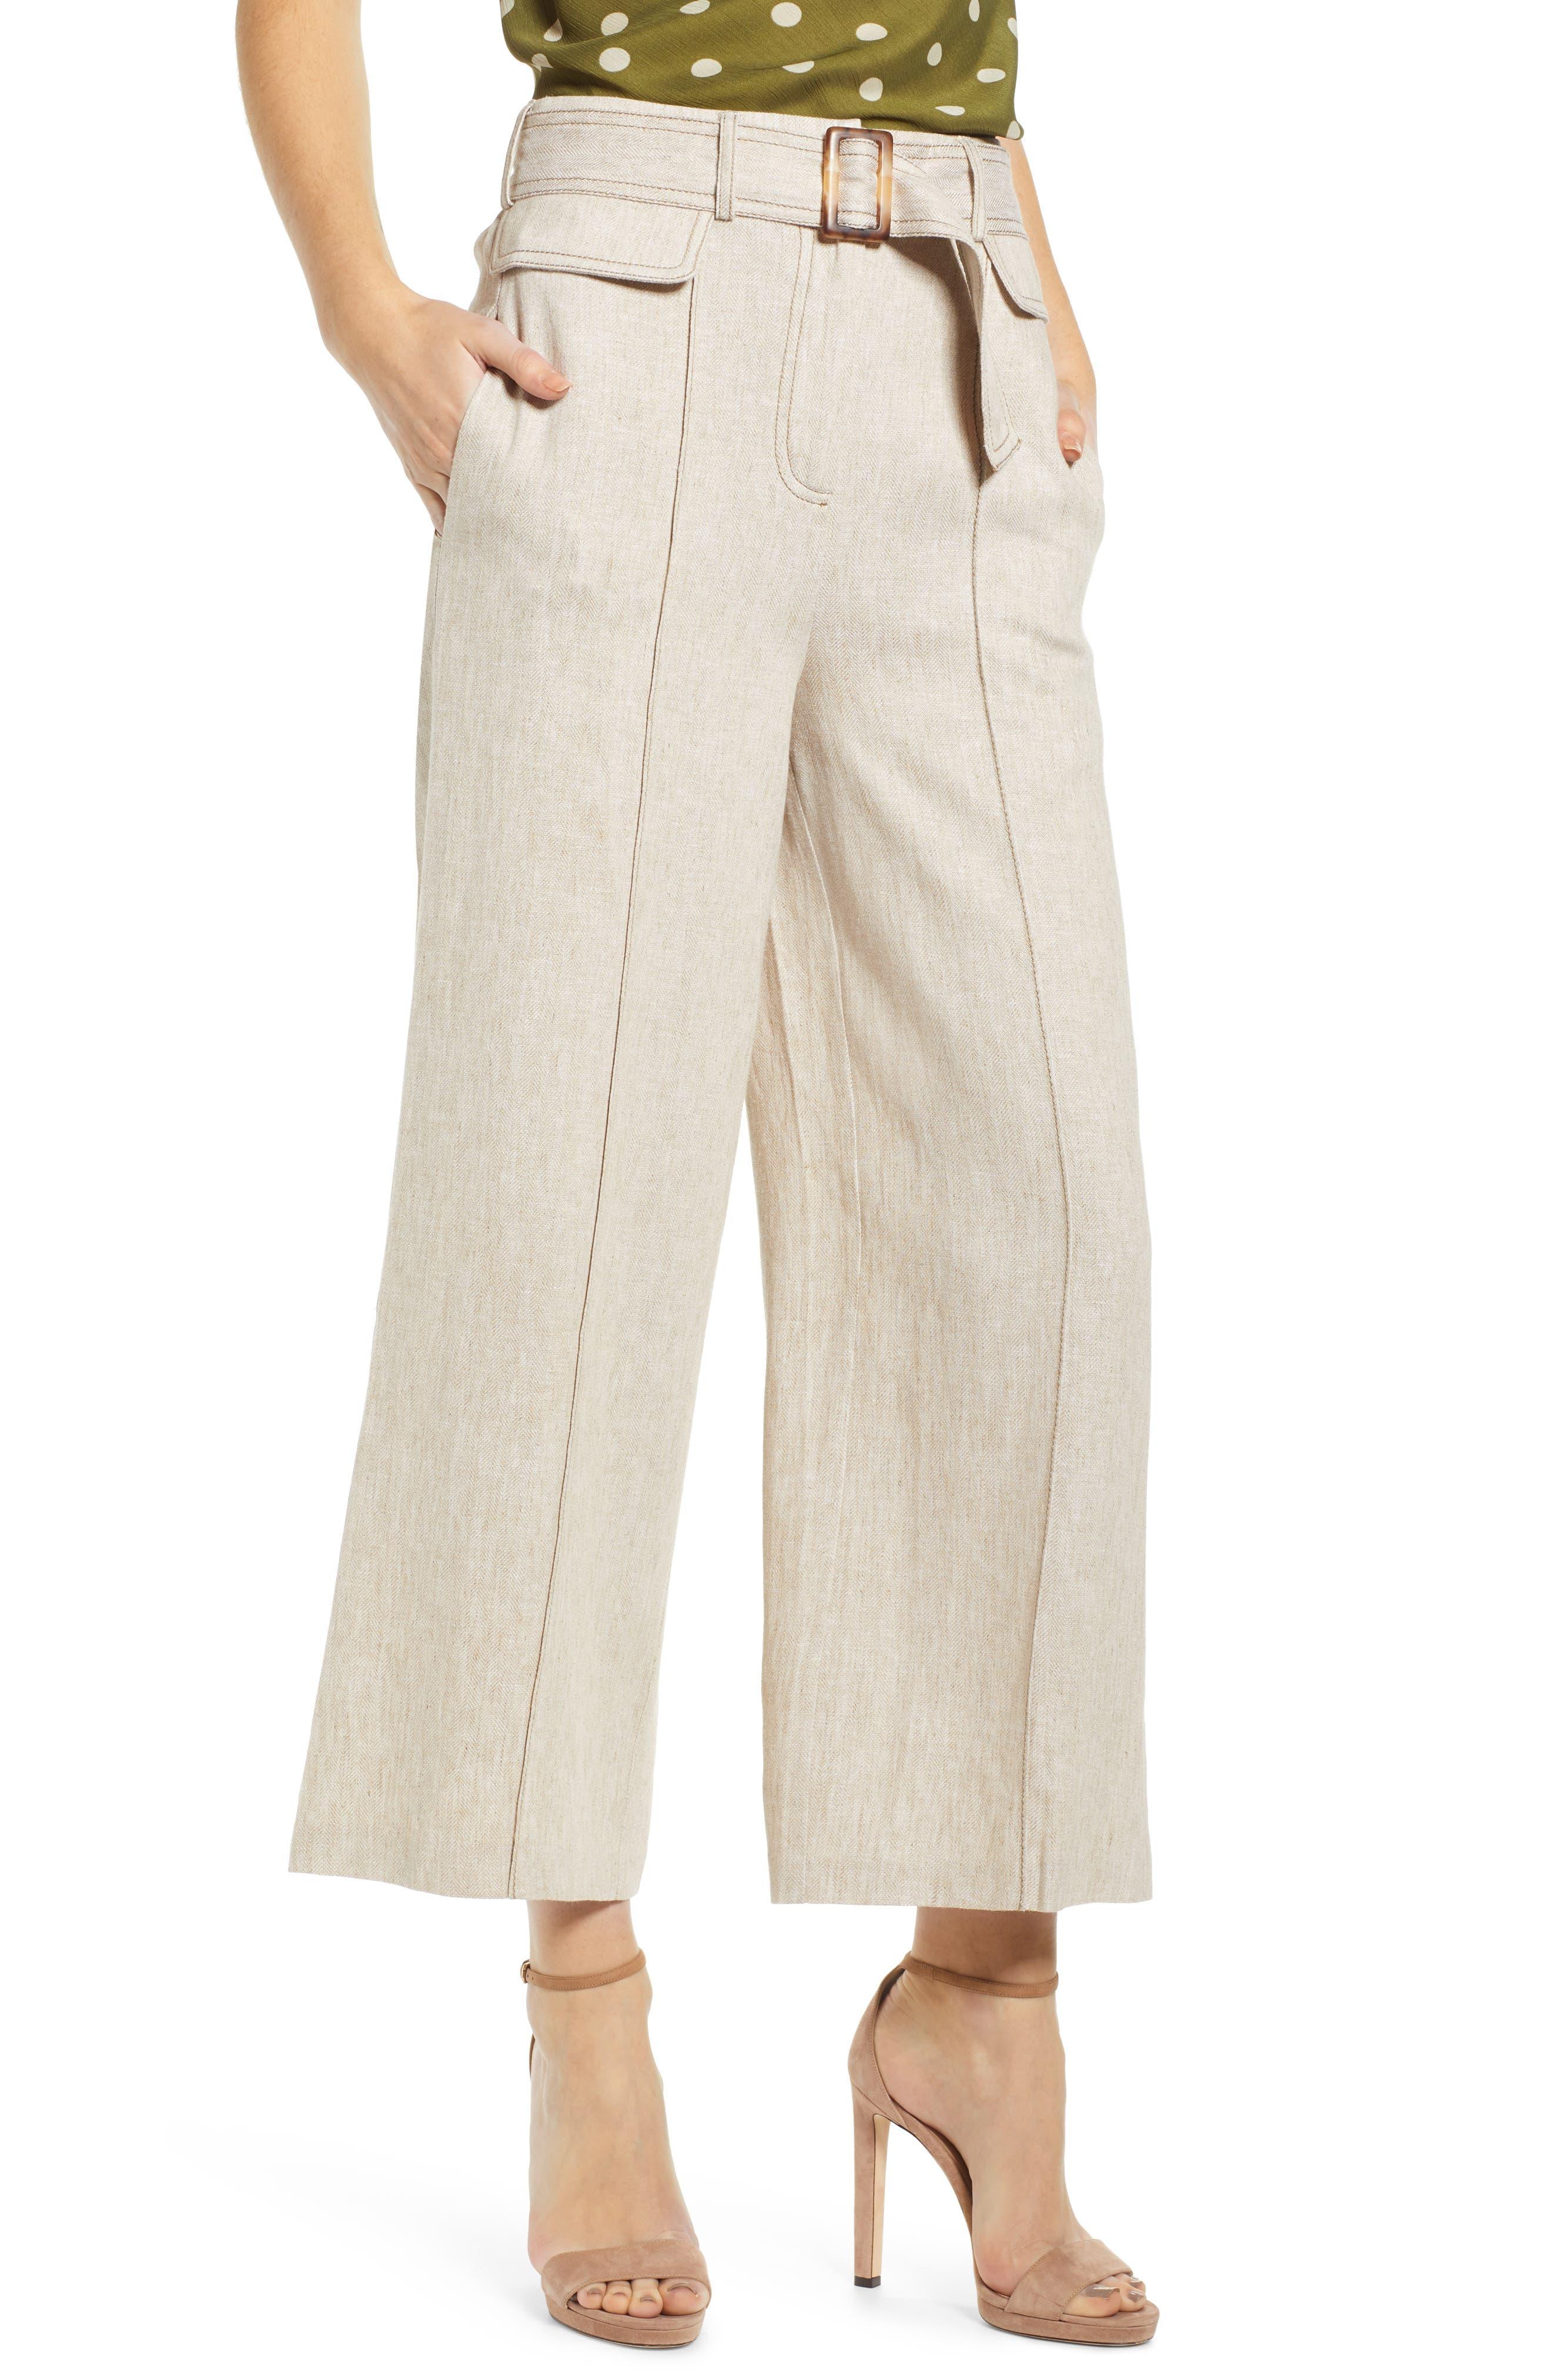 CHRISELLE LIM COLLECTION Chriselle Lim Toulouse Wide Leg Crop Trousers, Main, color, OATMEAL